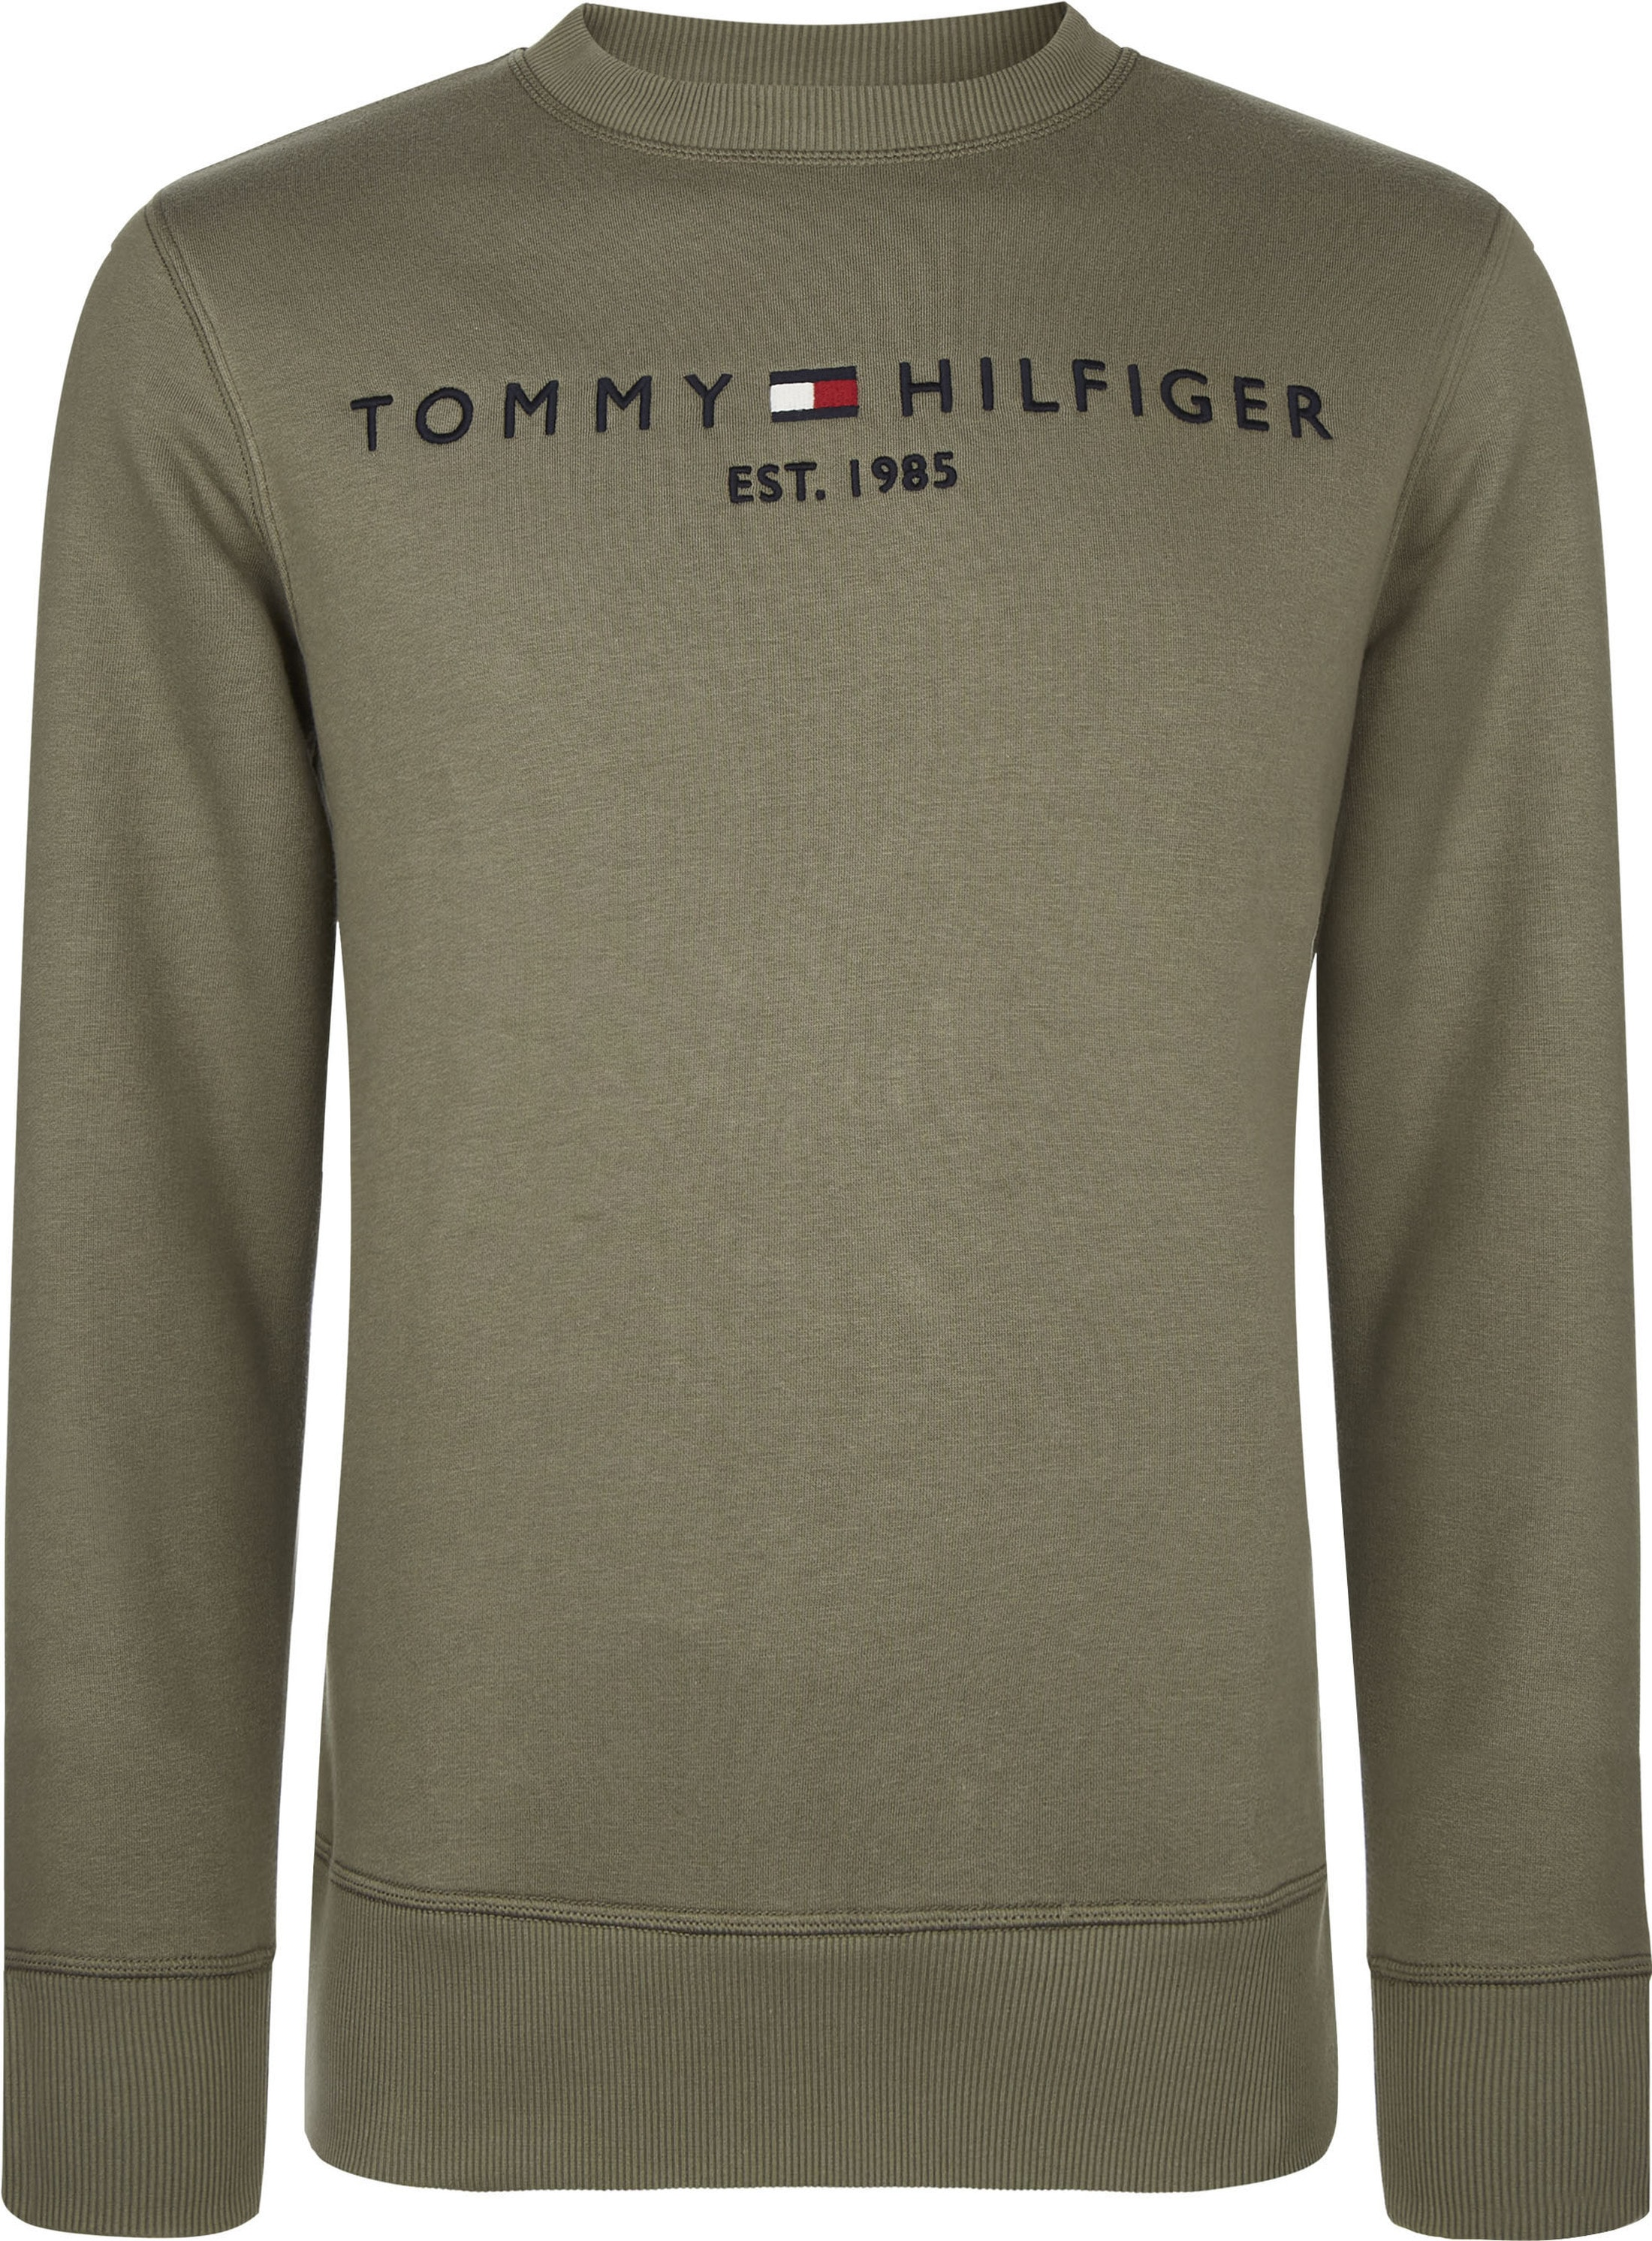 Tommy Hilfiger Sweater Olive foto 0